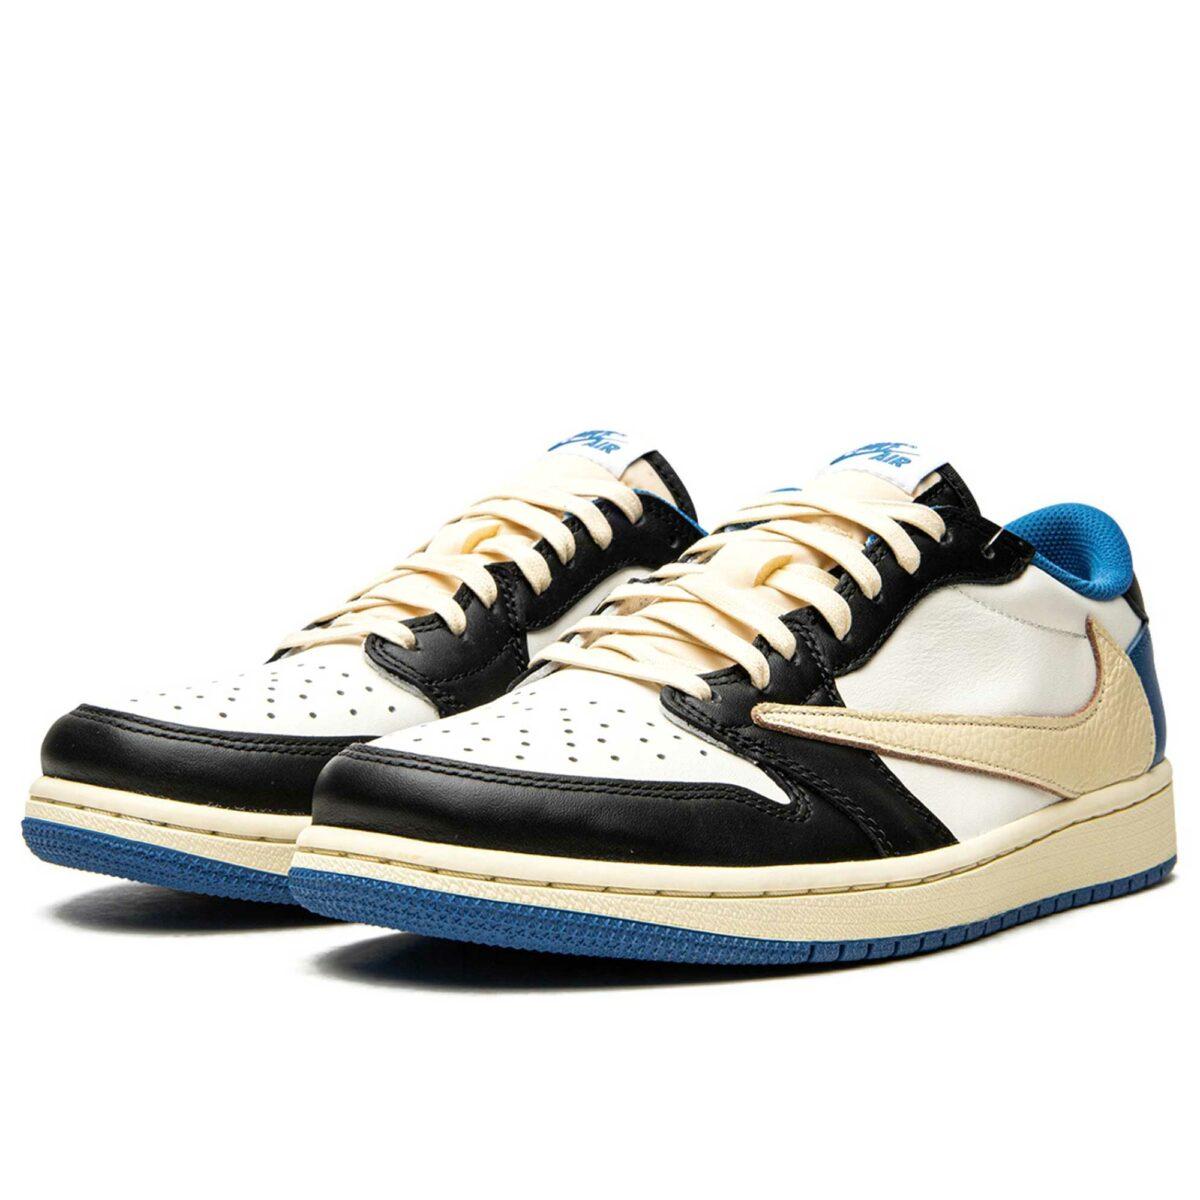 nike air Jordan 1 low og sp Travis Scott x Fragment DM7866_140 купить